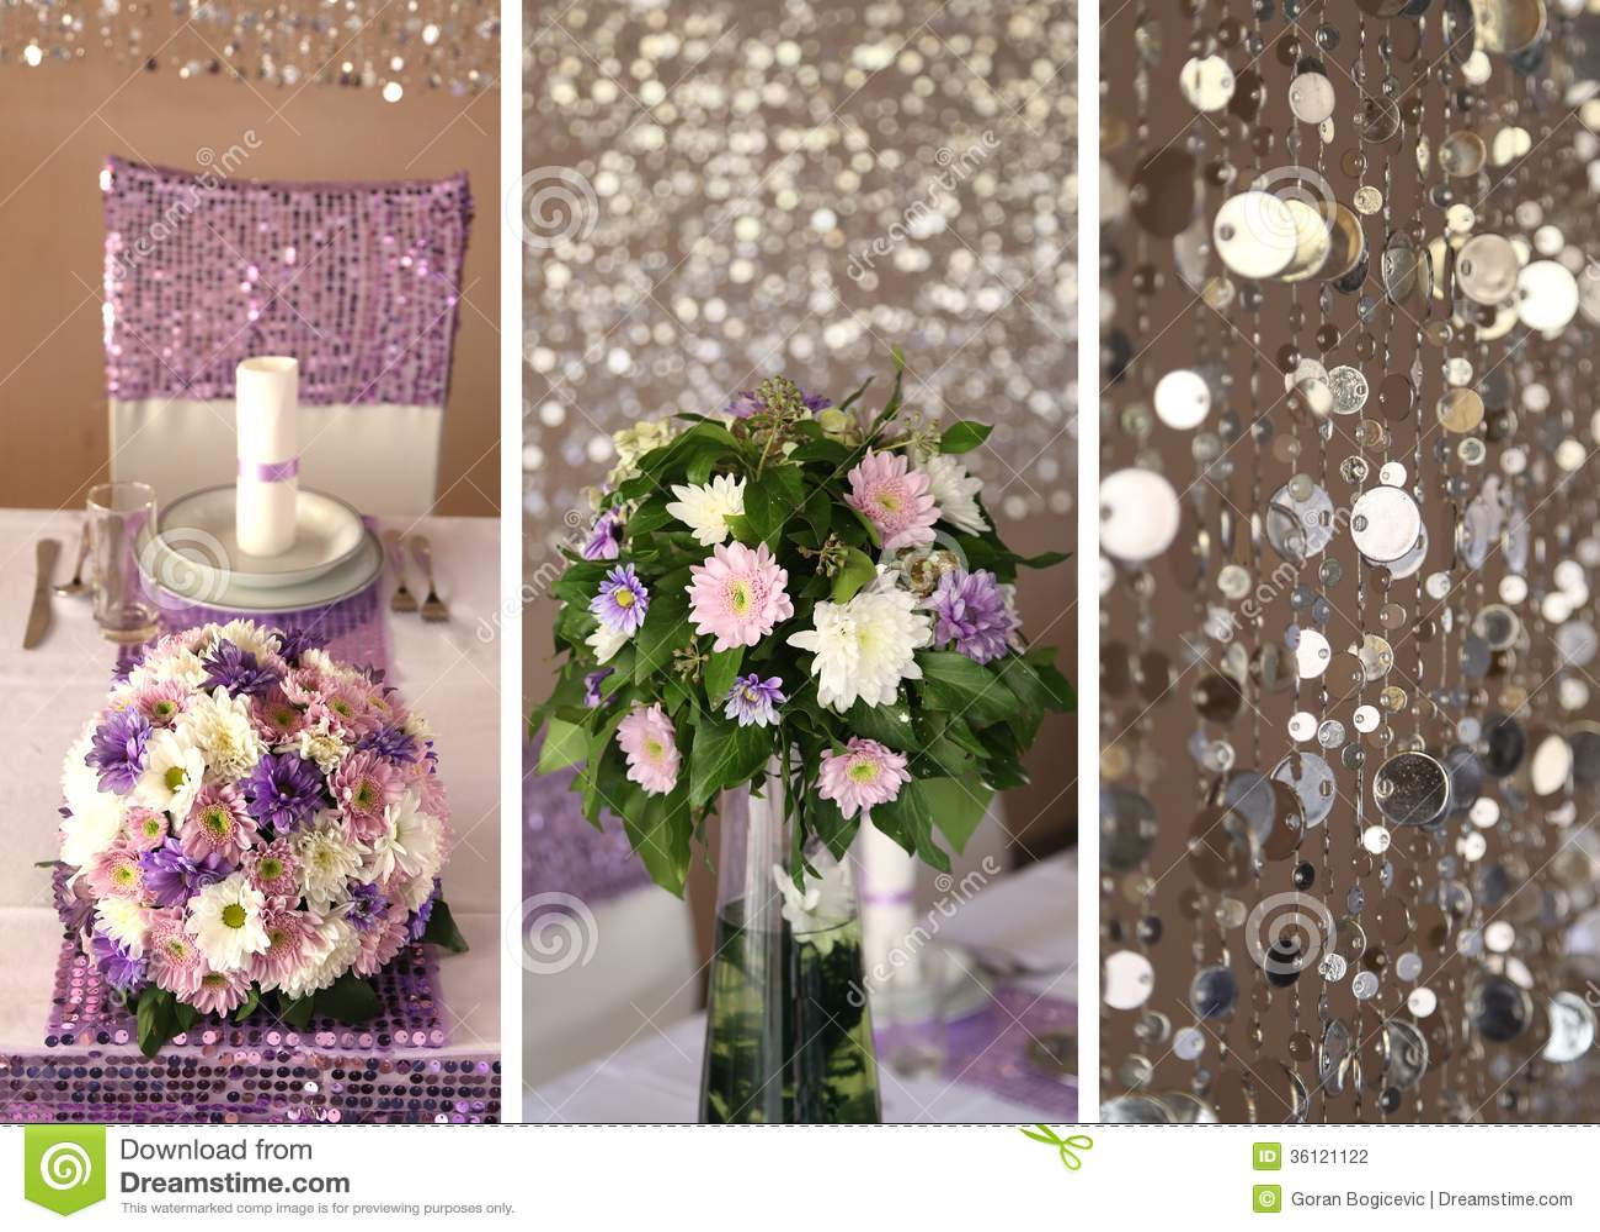 stock photography wedding decoration collage decorations image wedding decoration Wedding decoration